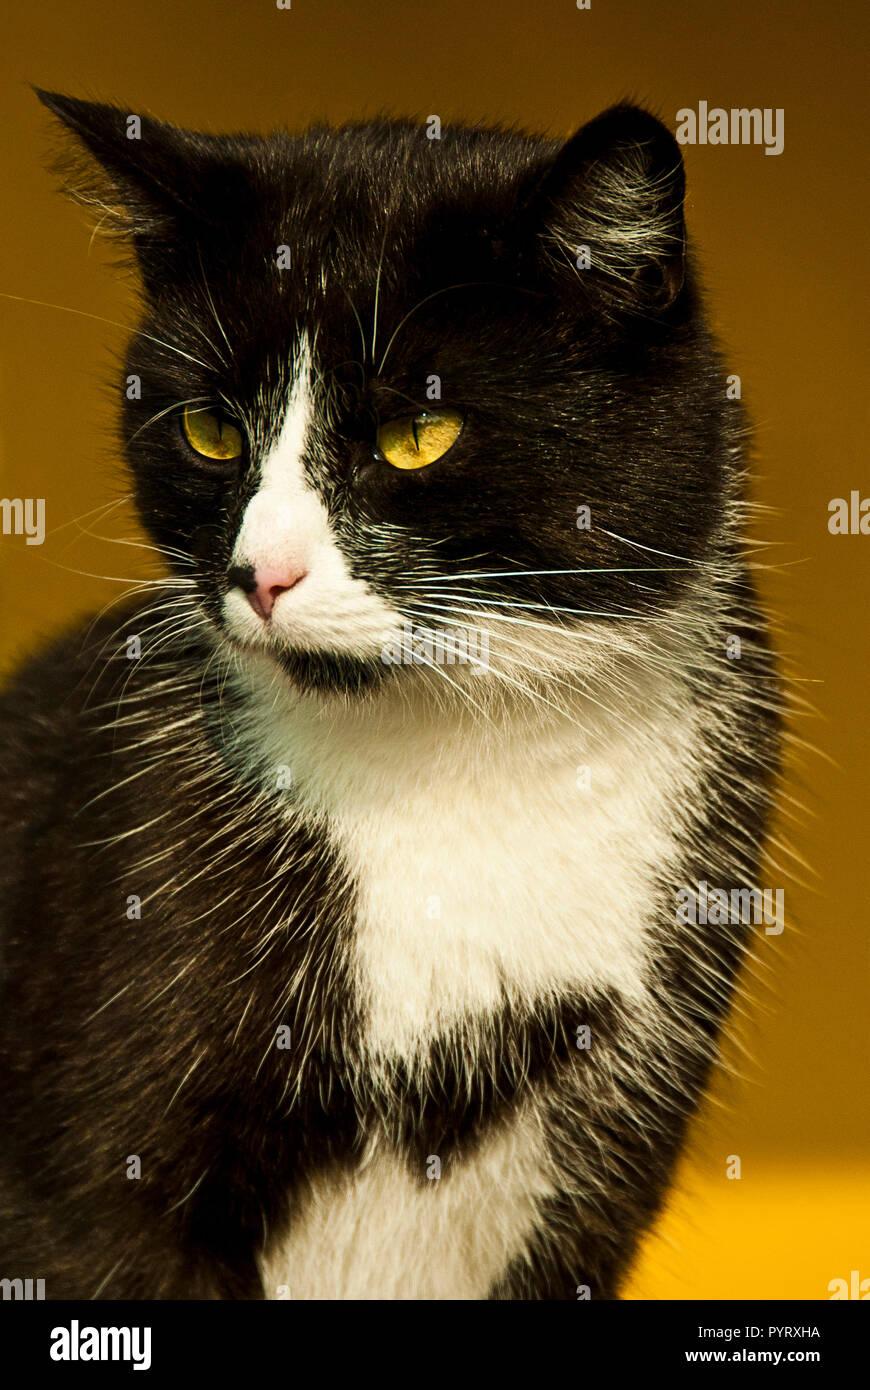 portrait of a domestic Bicolor or Tuxedo cat outdoor - Stock Image